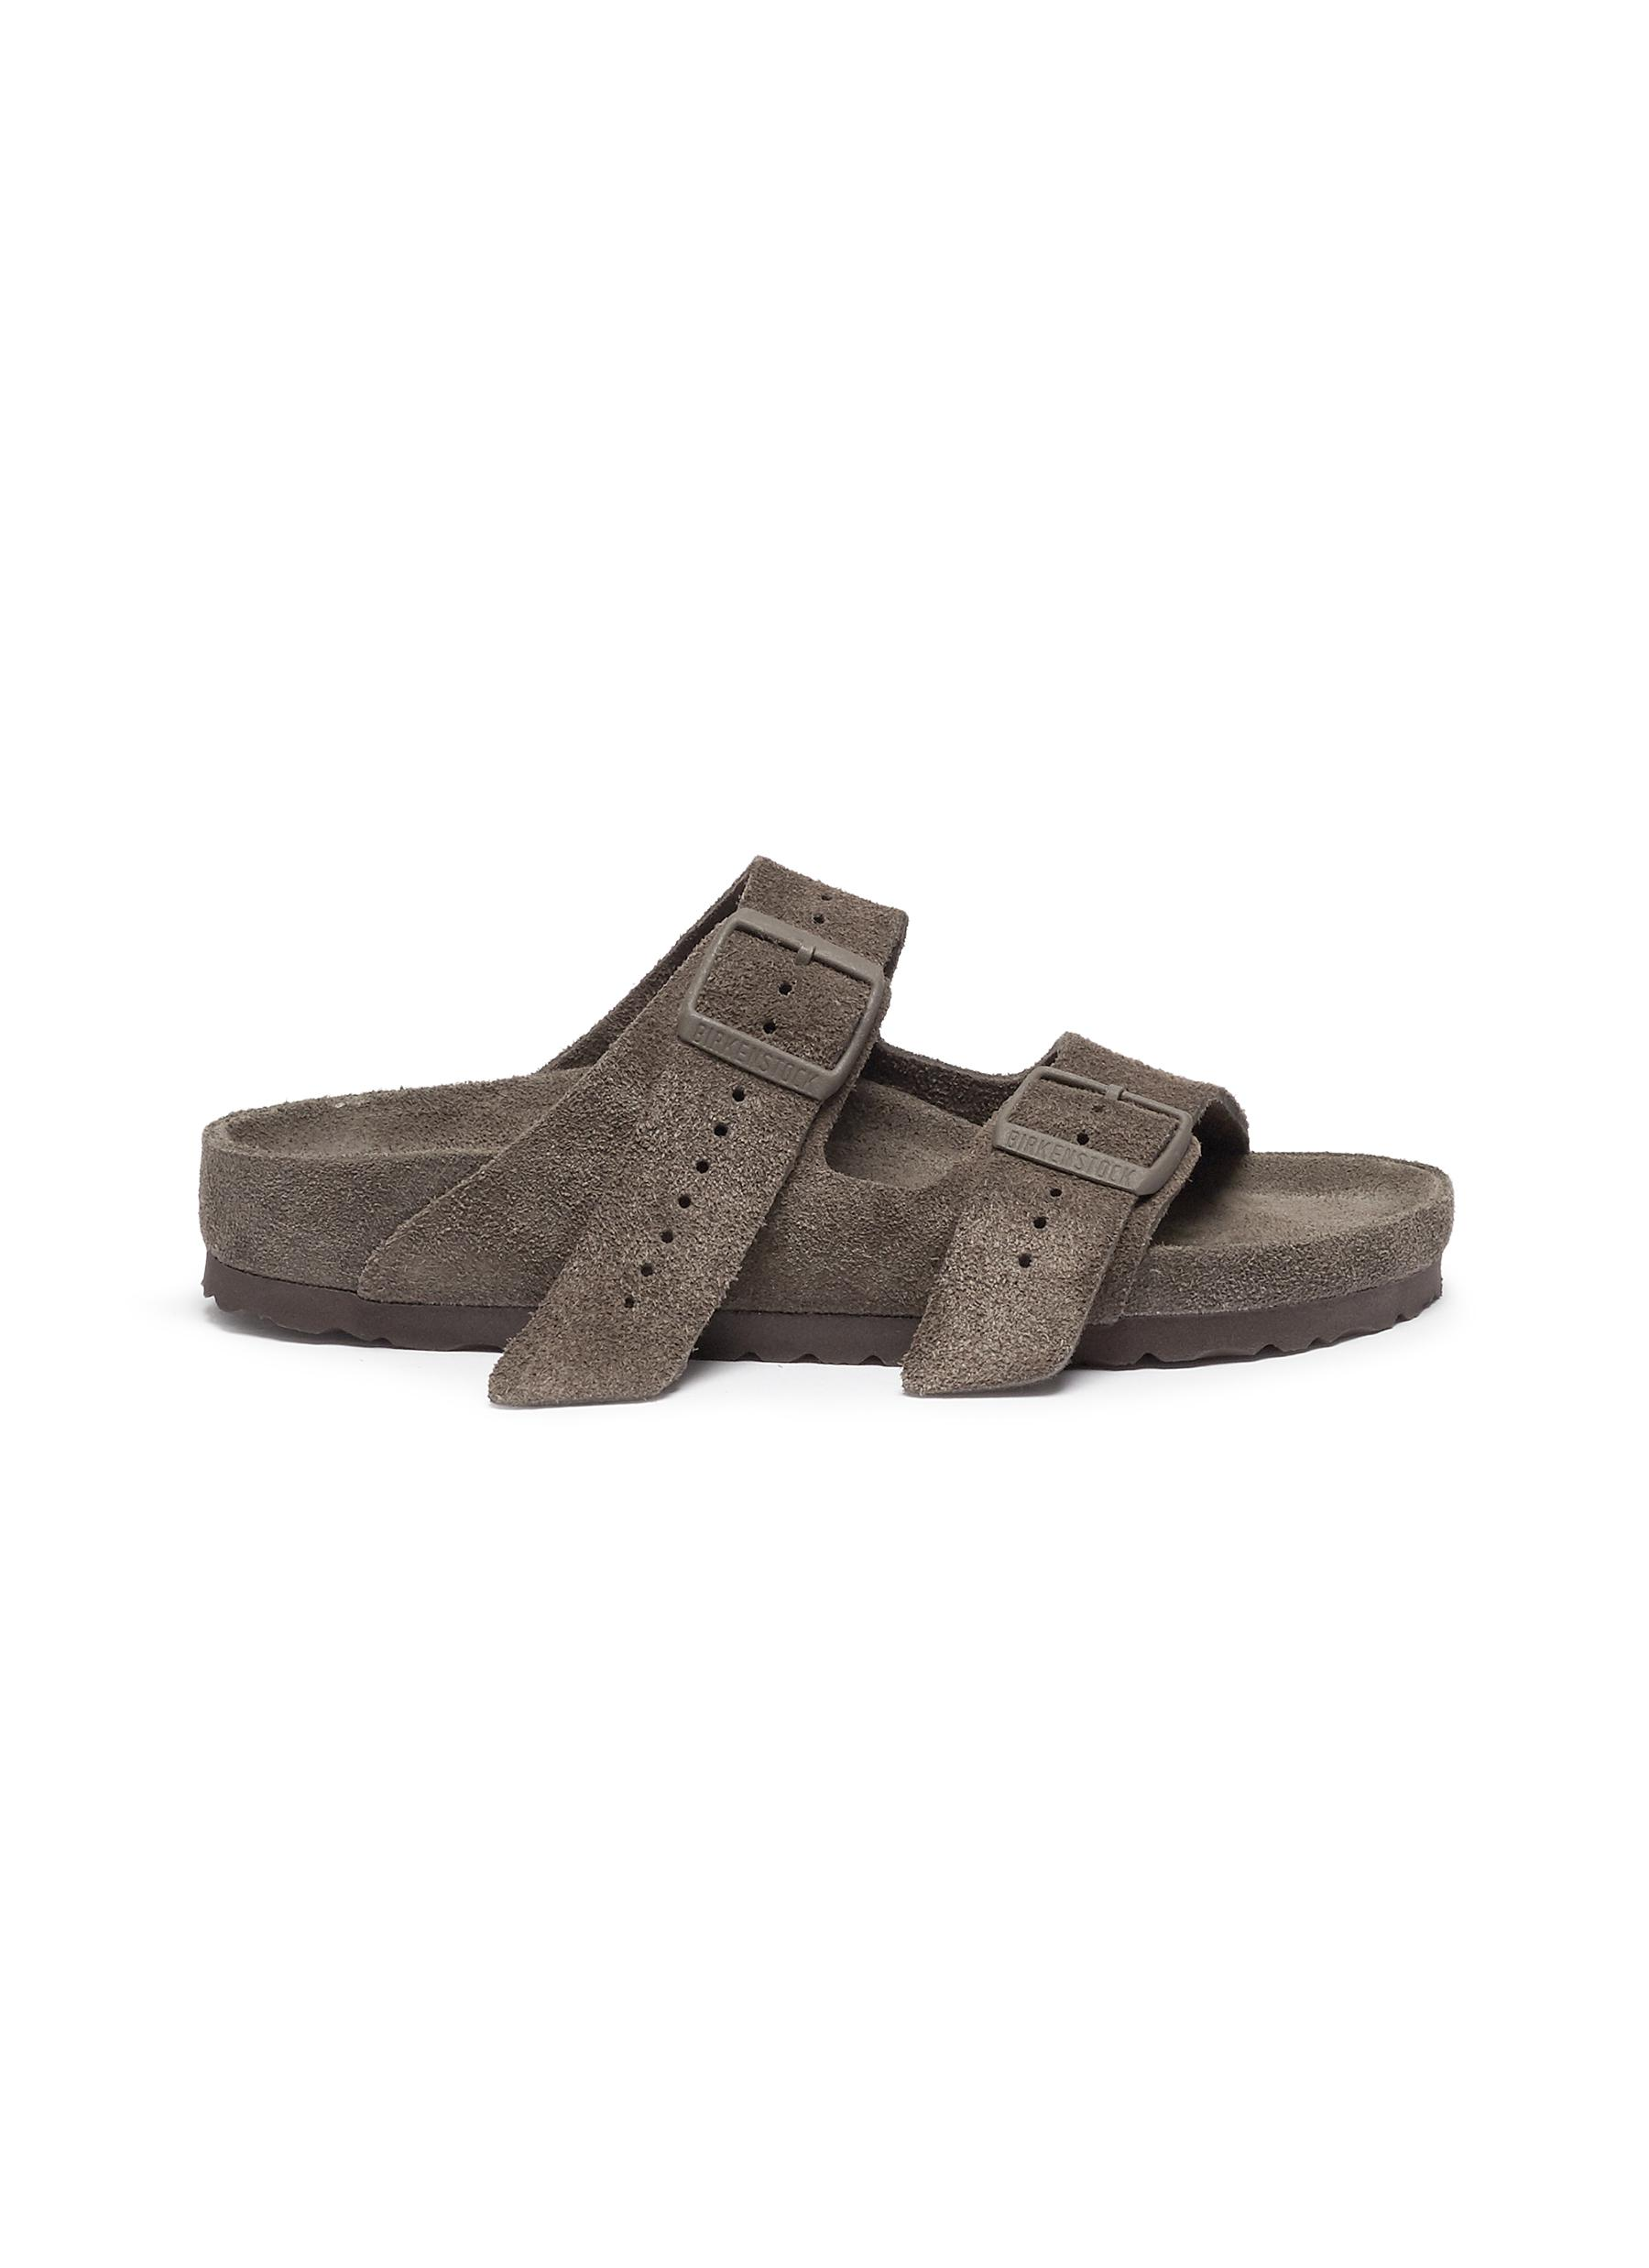 Photo of Arizona suede sandals by Rick Owens x BIRKENSTOCK womens shoes - buy Rick Owens x BIRKENSTOCK footwear online